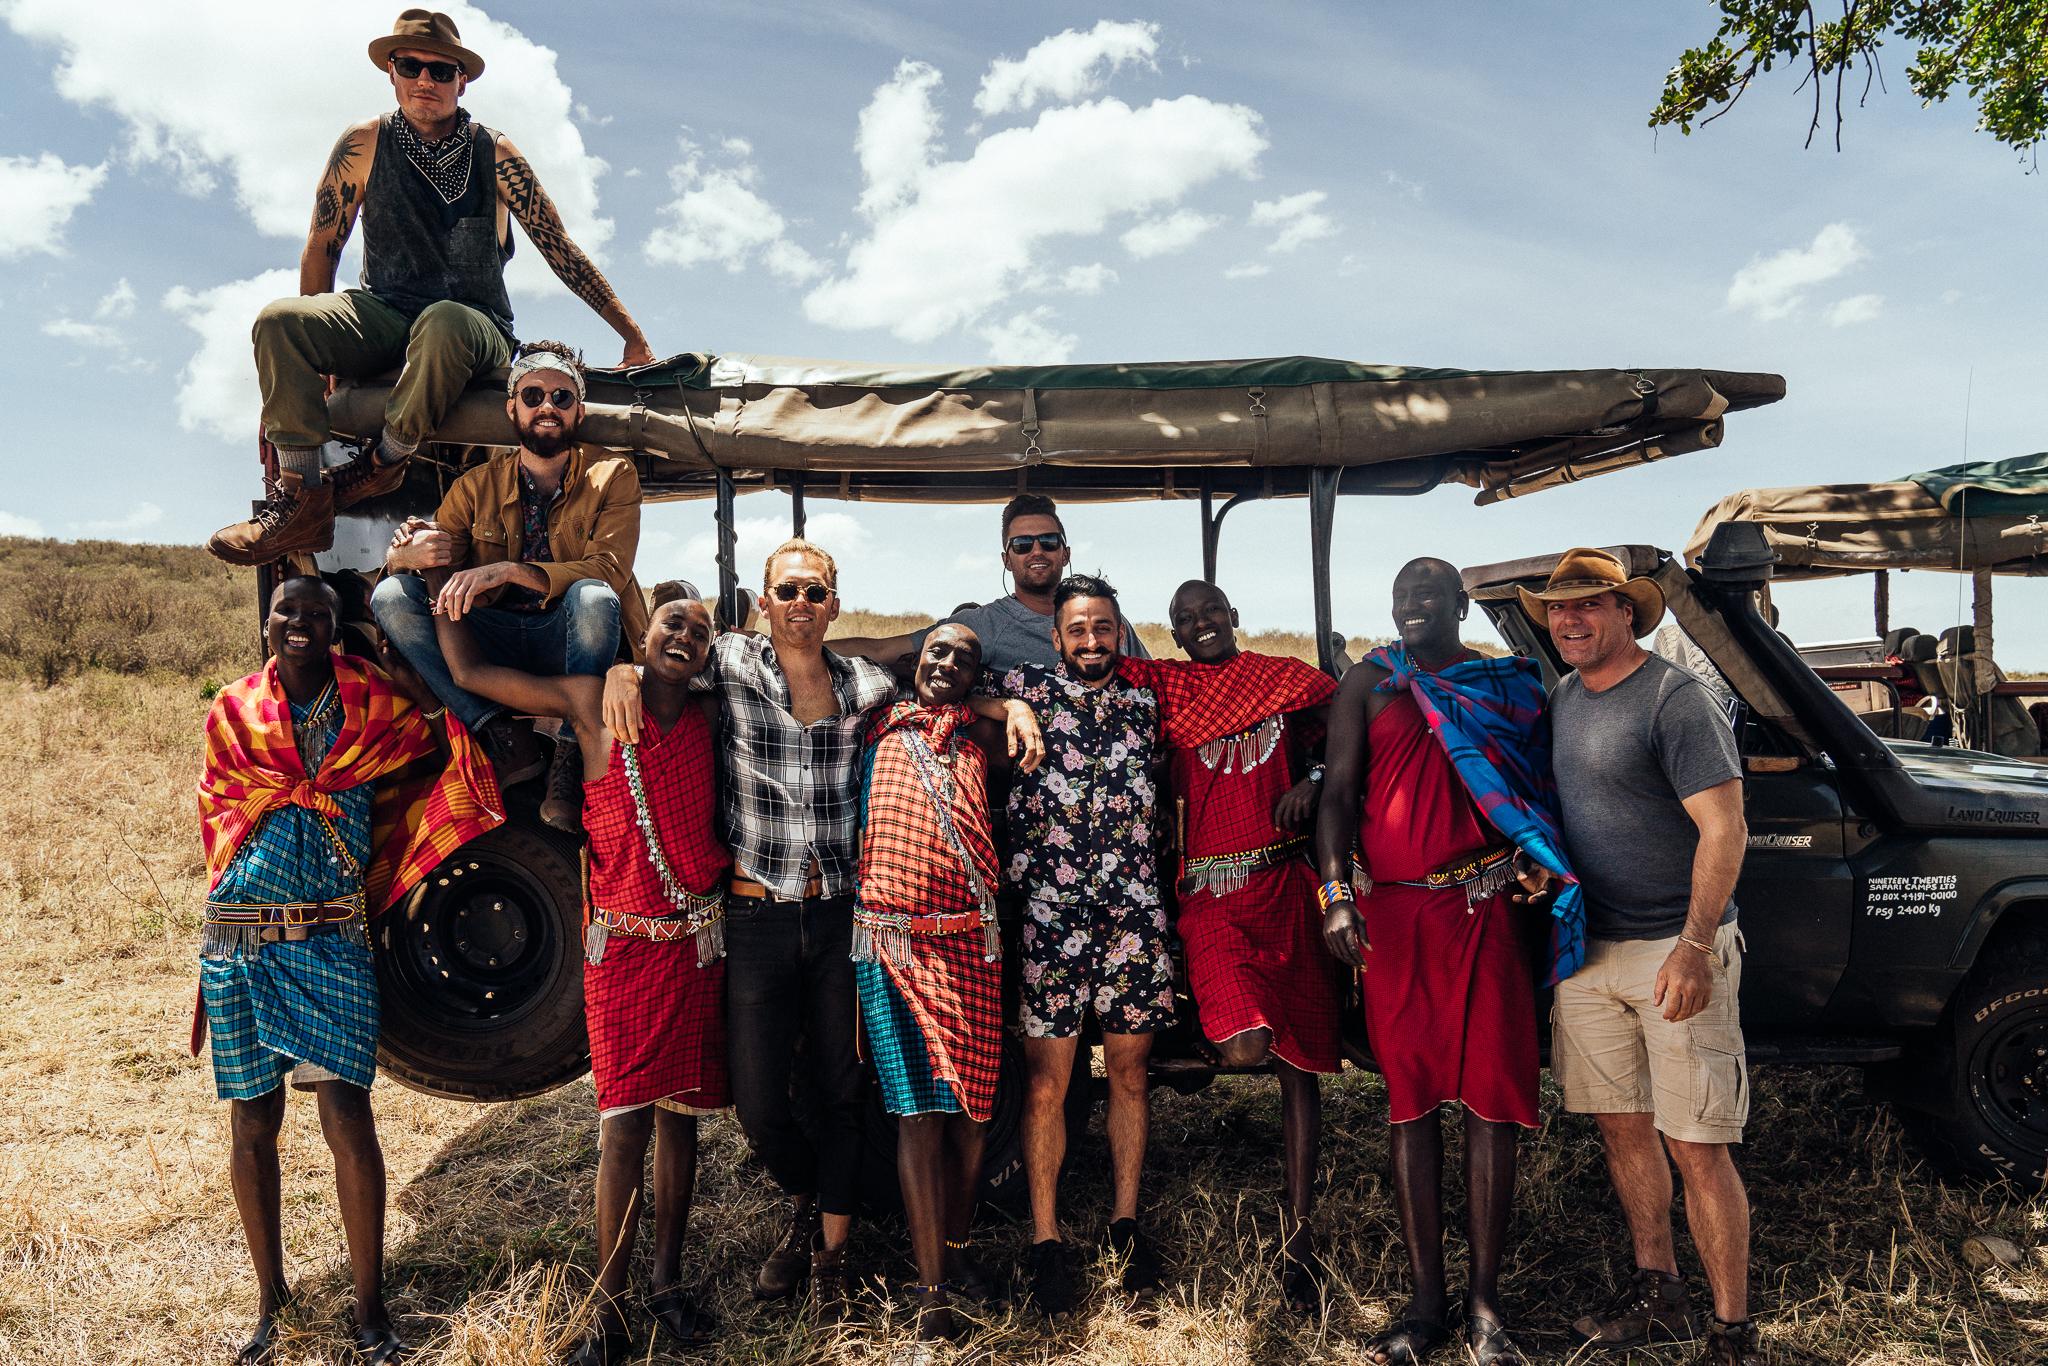 Safari Guys - Cottars 1920s Camp with Kin Travel Ph. Dave Krugman